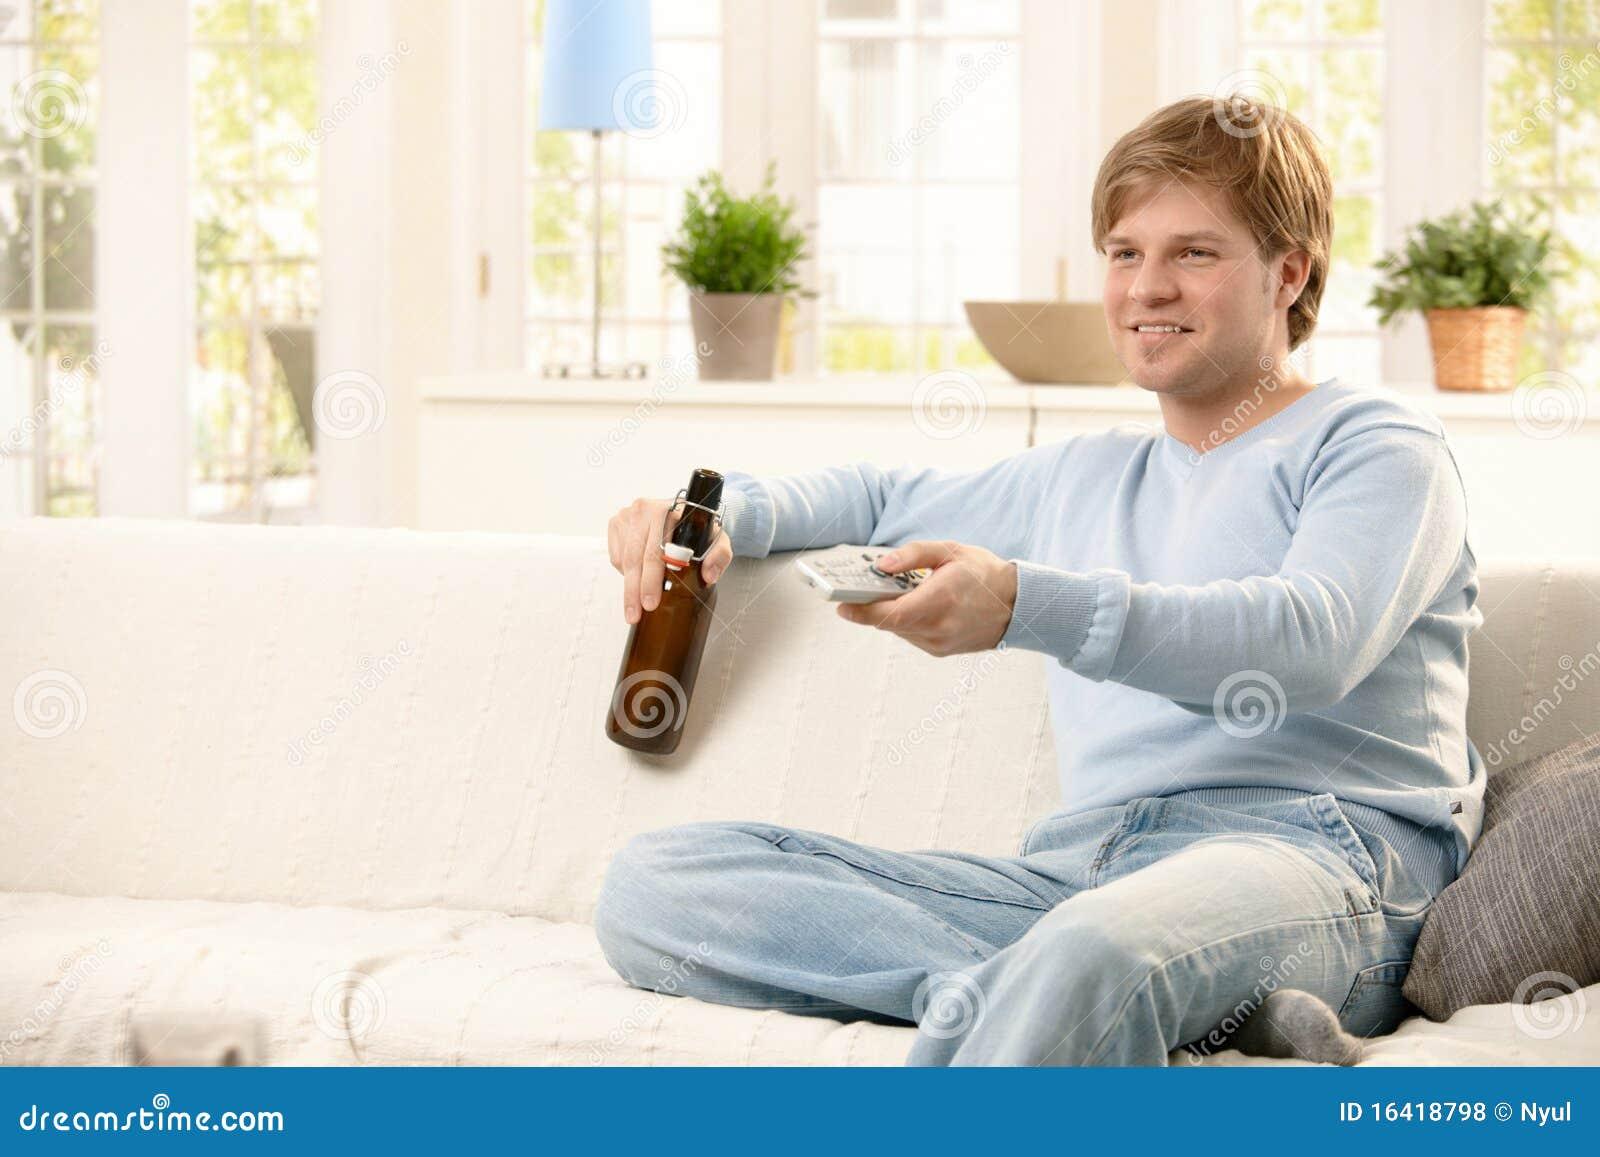 Man Relaxing At Home Royalty Free Stock Photos Image